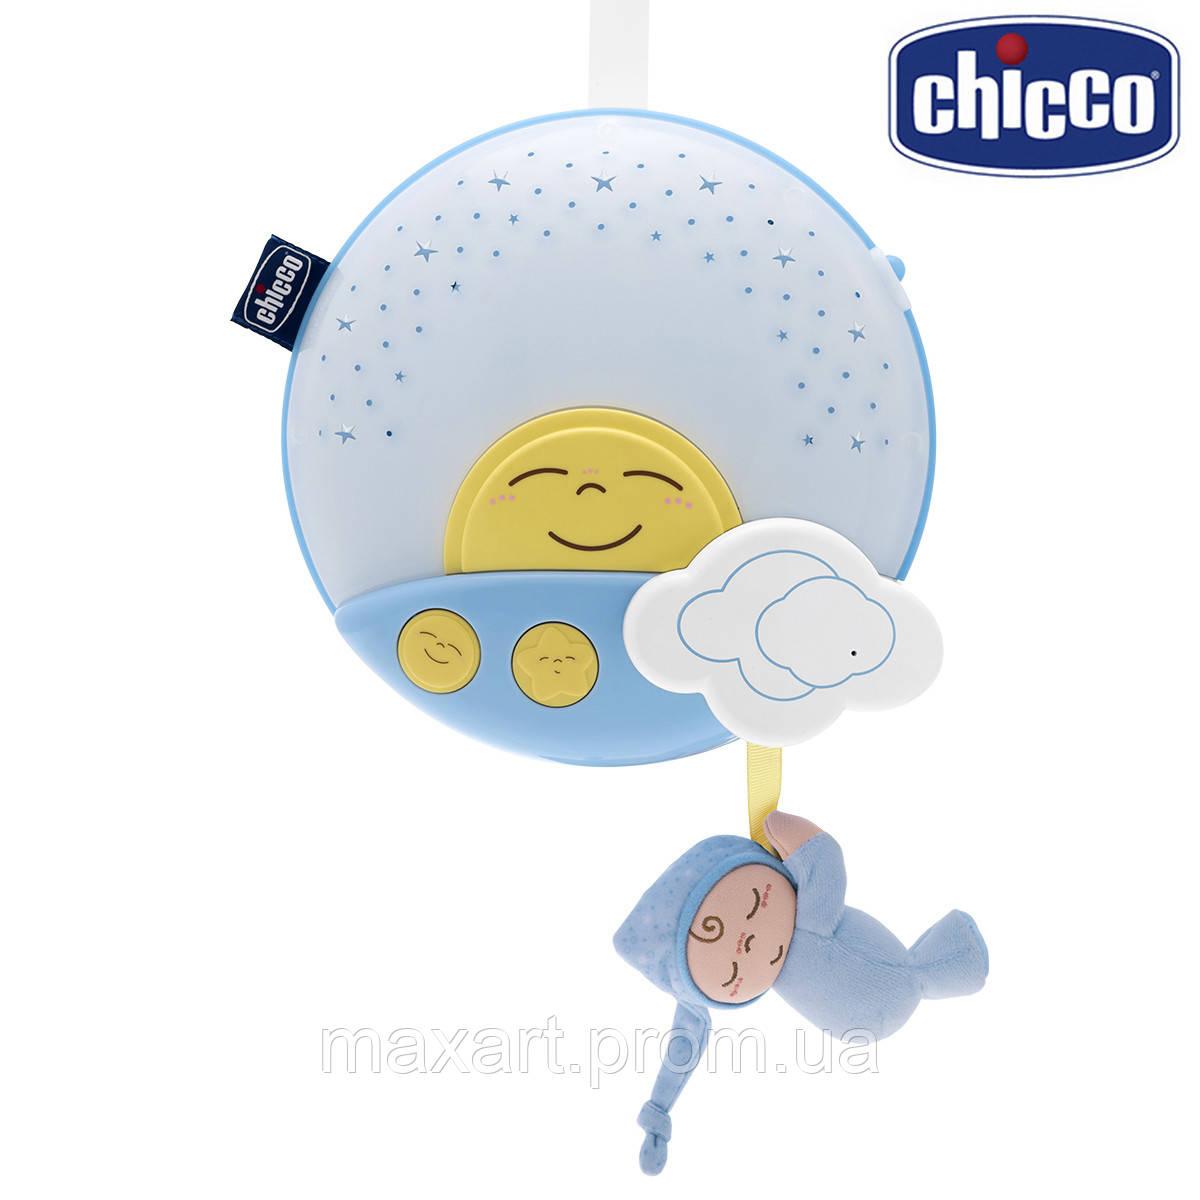 Музыкальная панель Chicco - Sunset (06992.20) голубой